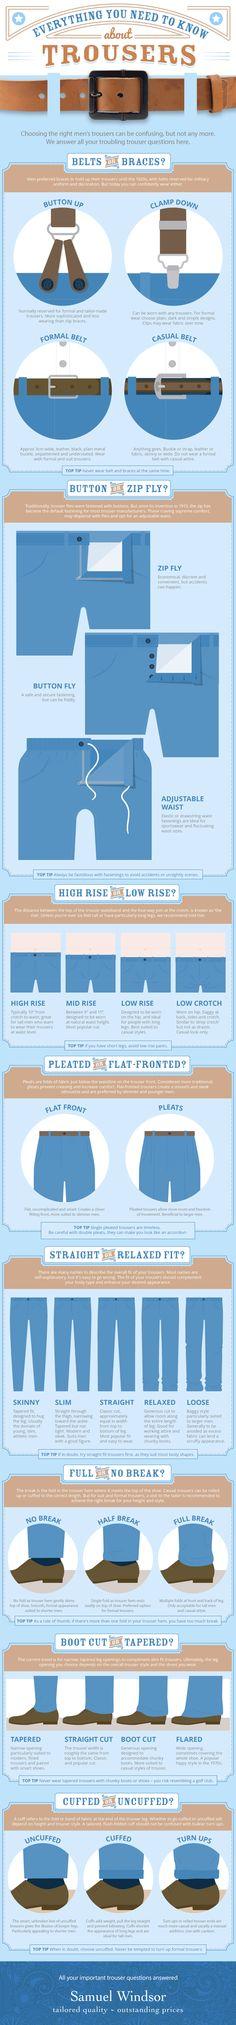 Samuel Windsor mens trousers infographic